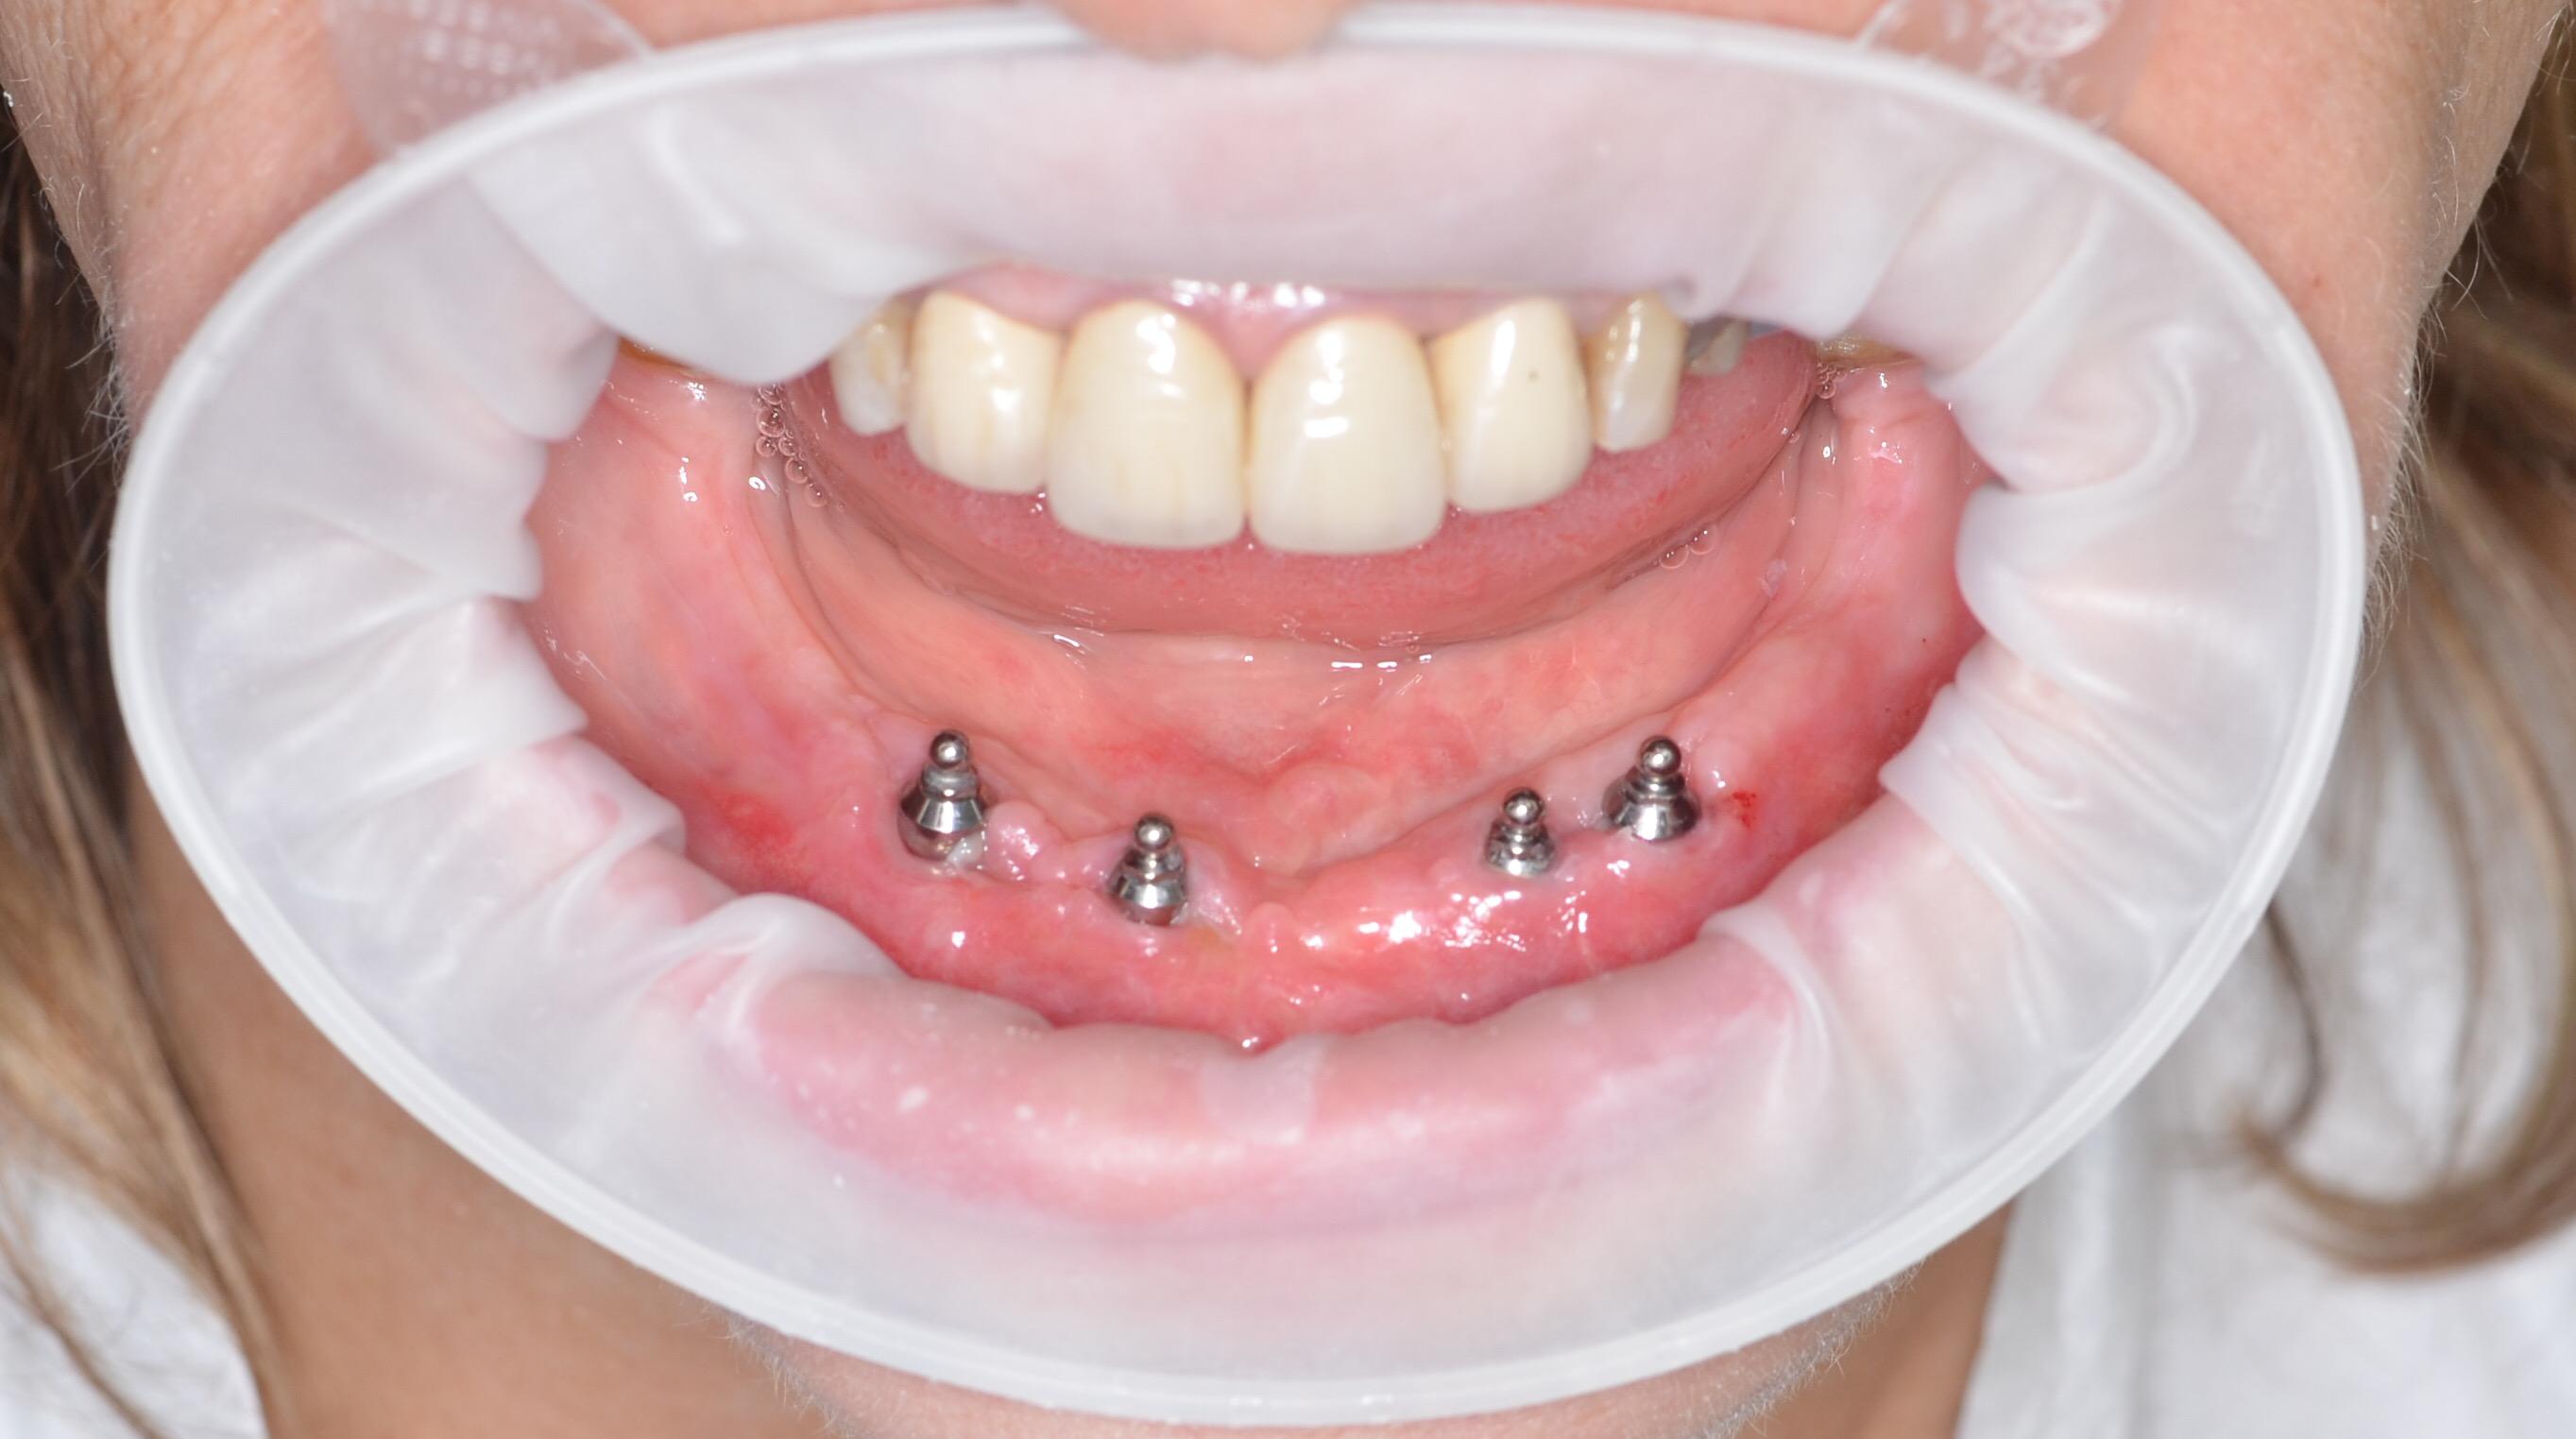 Alt çene 4 implant